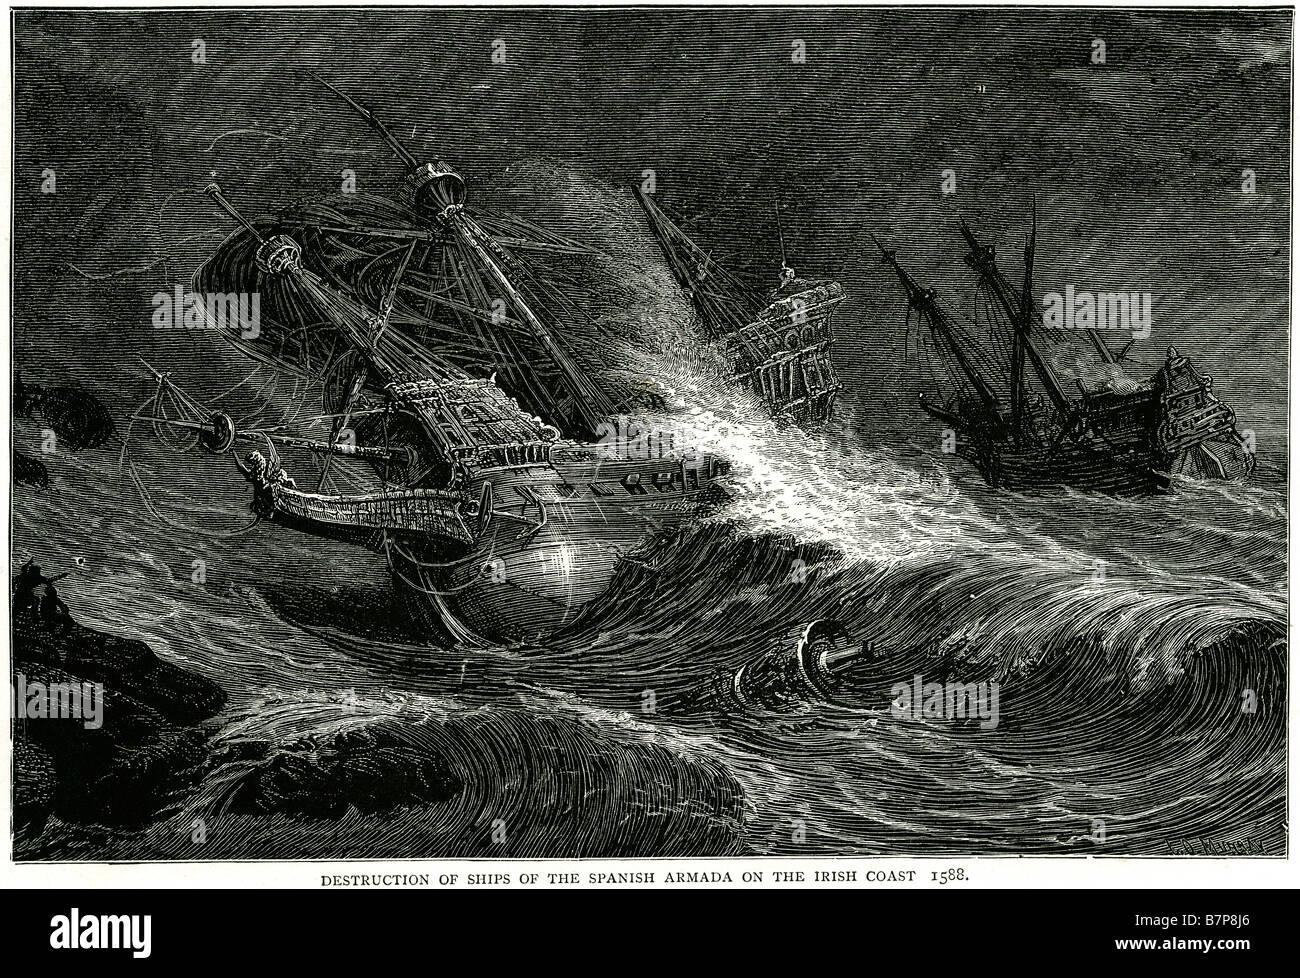 Destruction ships spanish armada irish coast 1588 Invincible Navy Storm Battle ship Fleet sea Water Sailing Sail - Stock Image